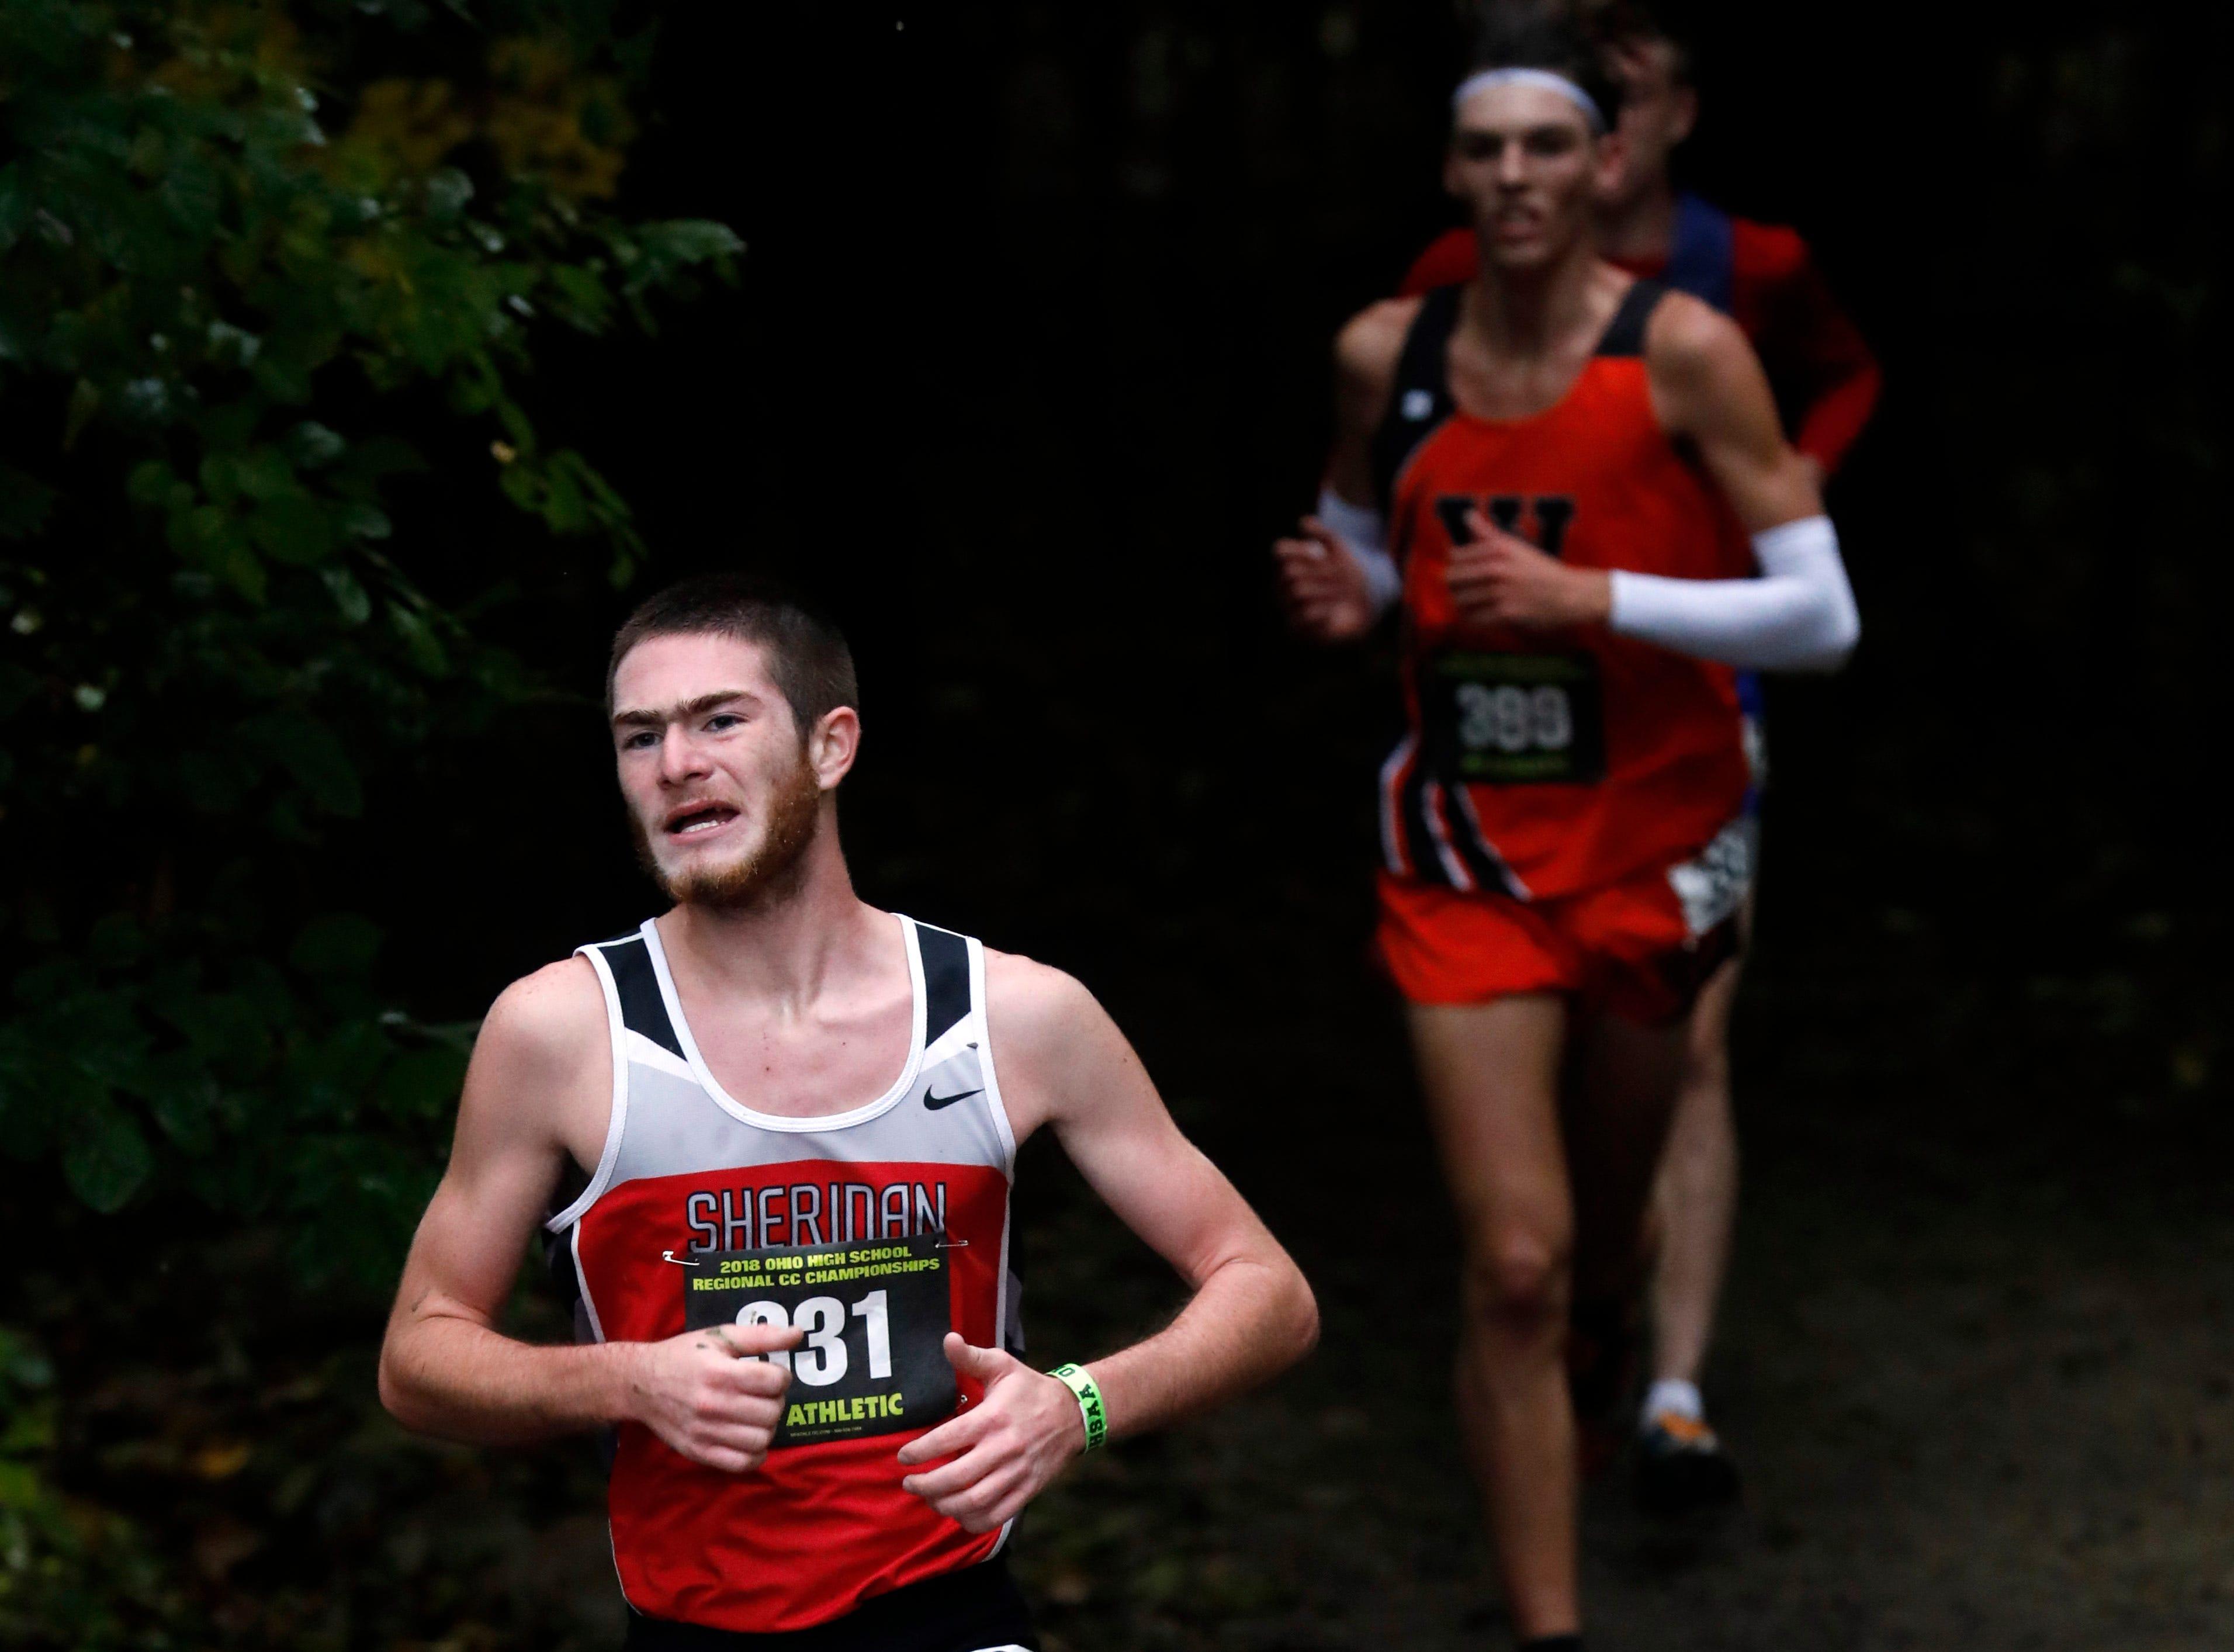 Sheridan's Luke Foster runs in the Regional Cross Country meet Saturday, Oct. 27, 2018, at Pickerington North High School in Pickerington.